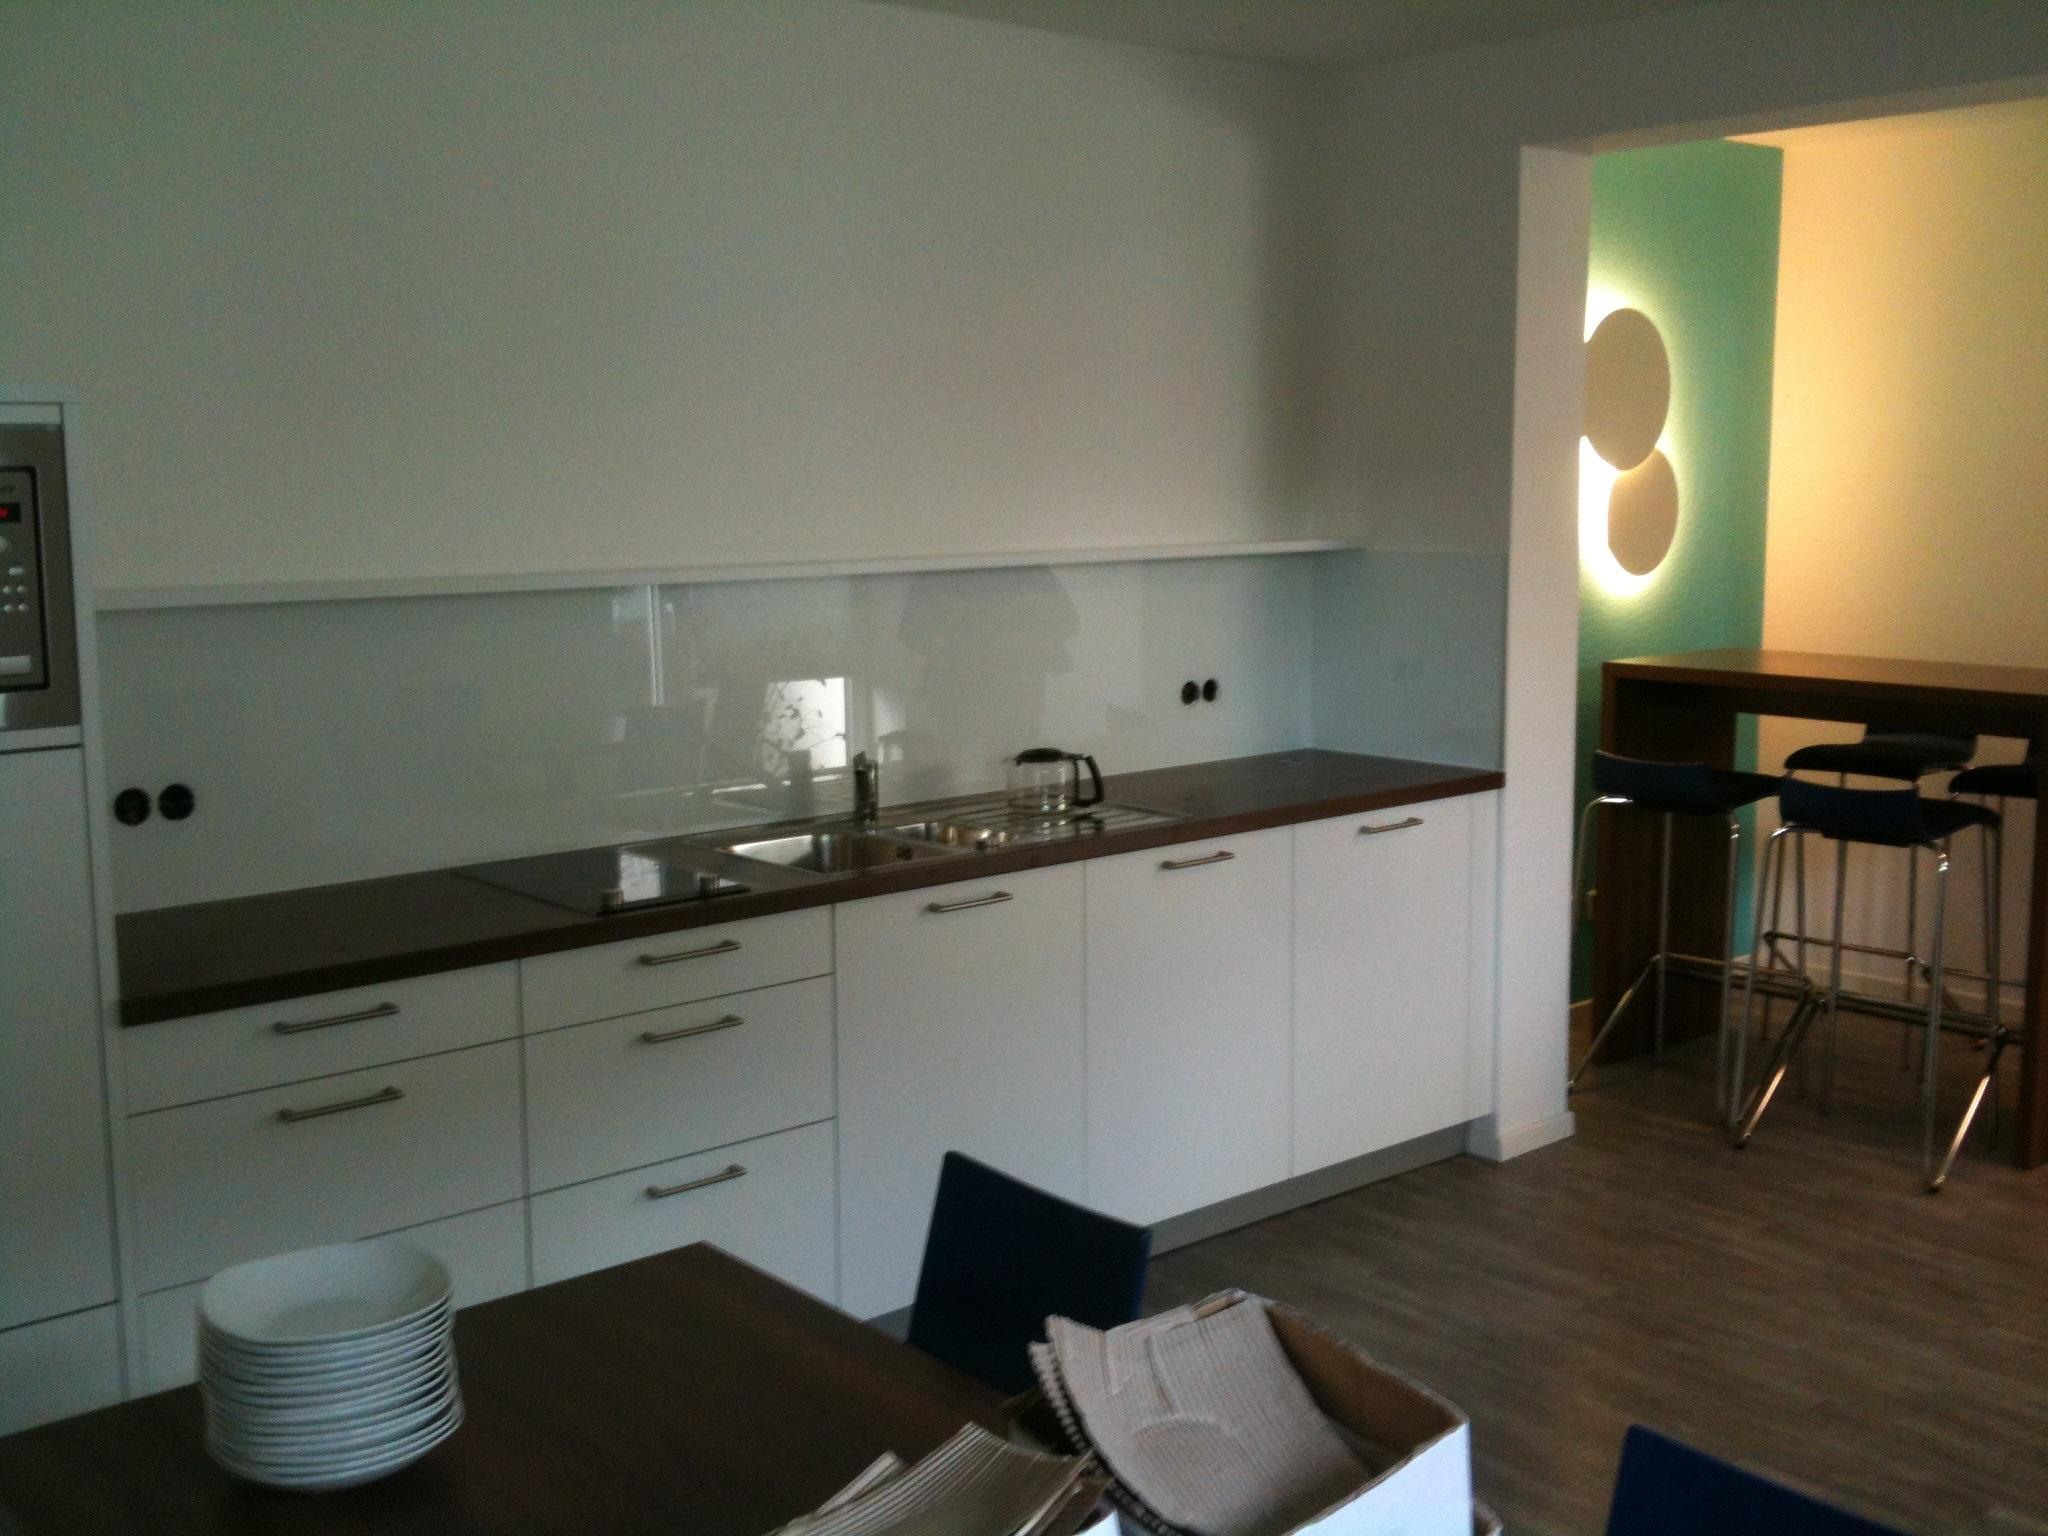 Full Size of Fliesenspiegel Verkleiden Kchenrckwandglas Rckwandglas Wandpaneel Küche Selber Machen Glas Wohnzimmer Fliesenspiegel Verkleiden